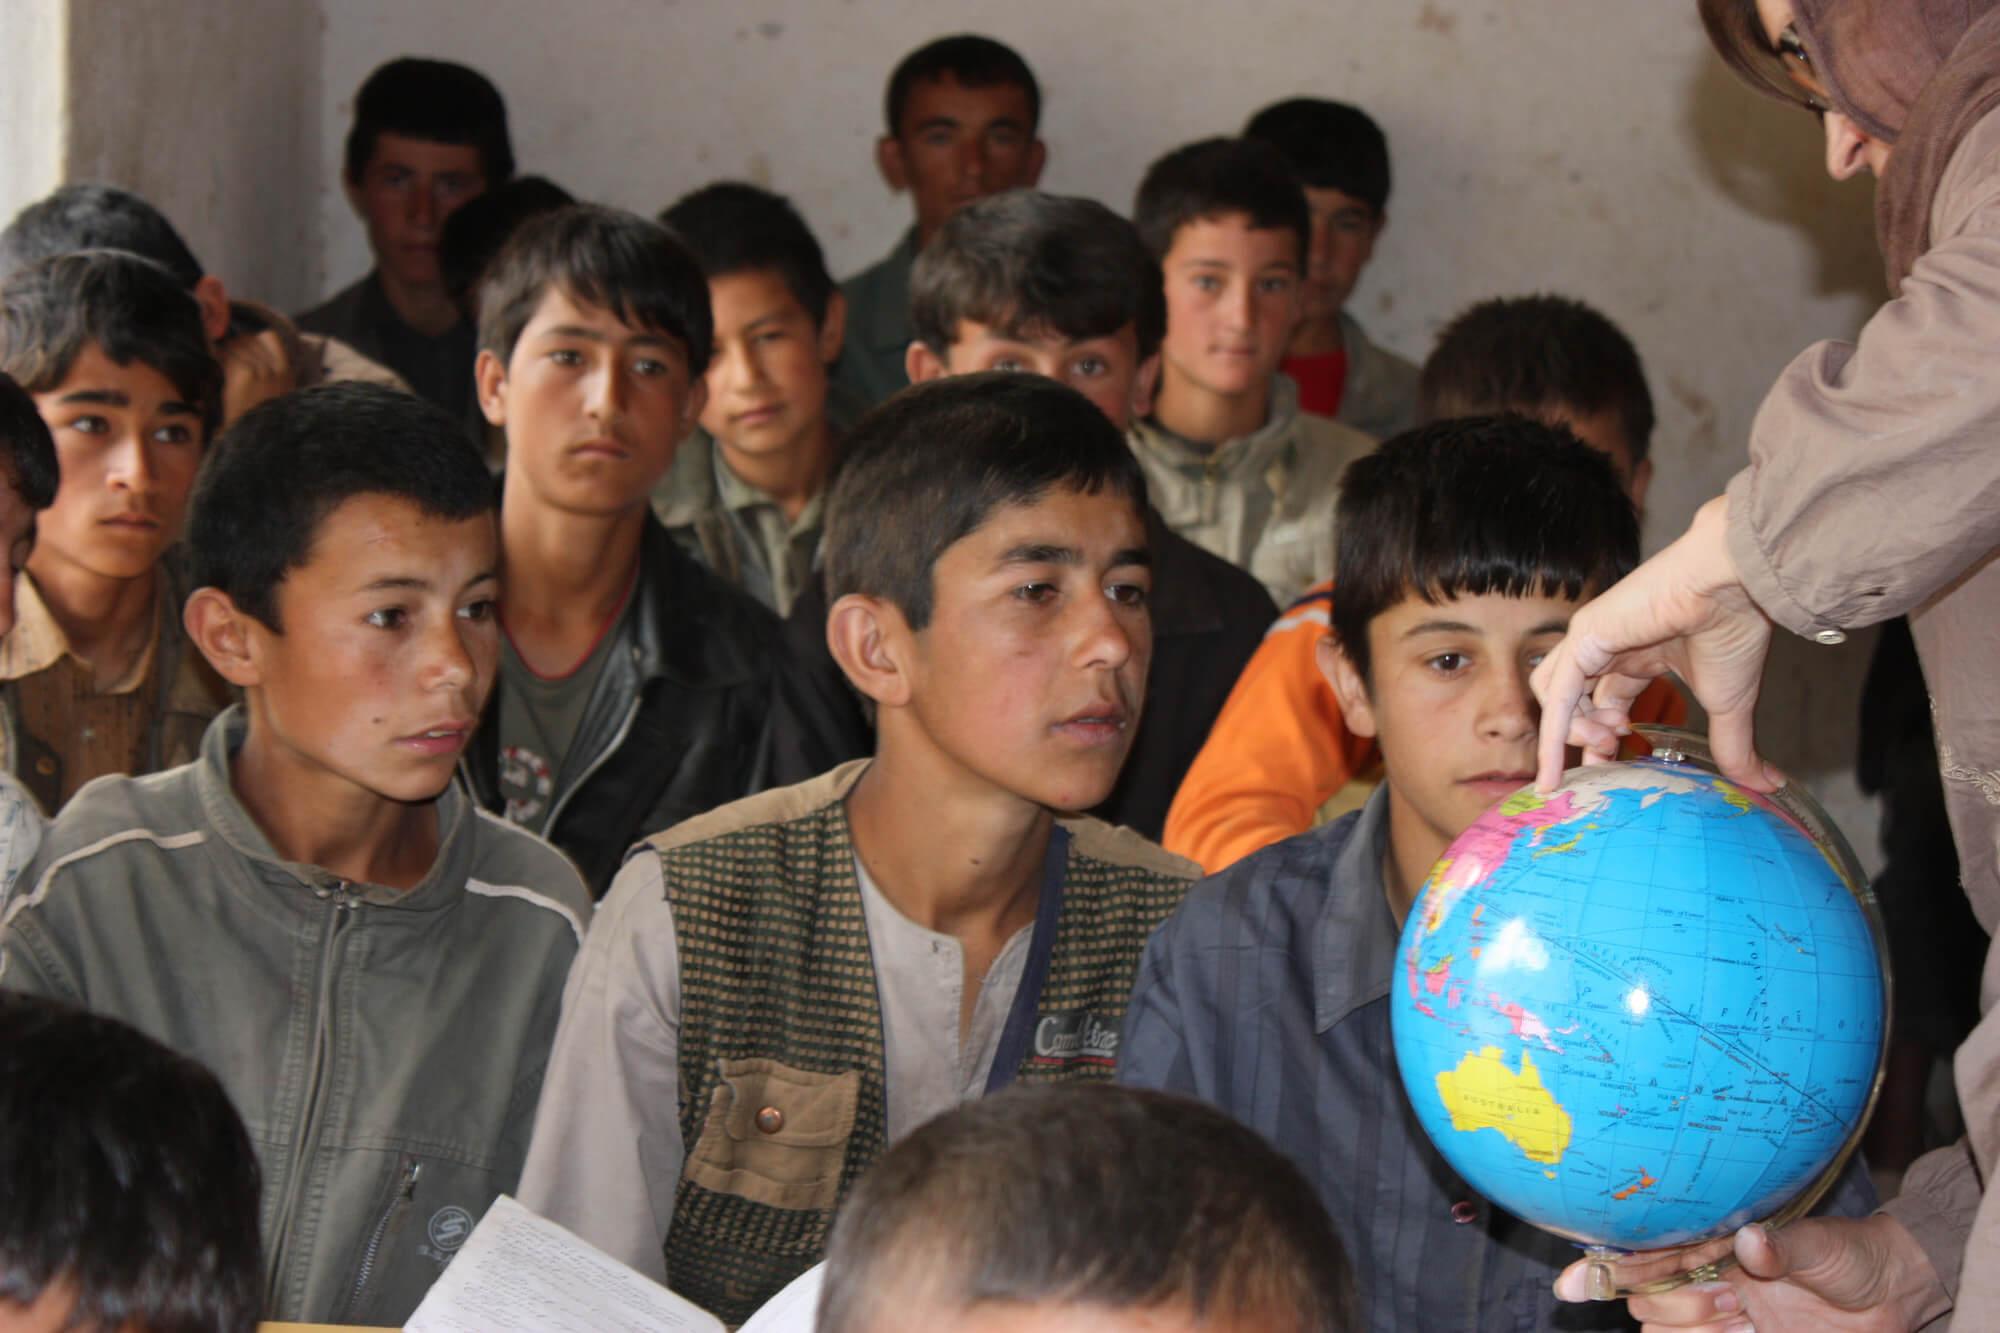 5afganistan deti